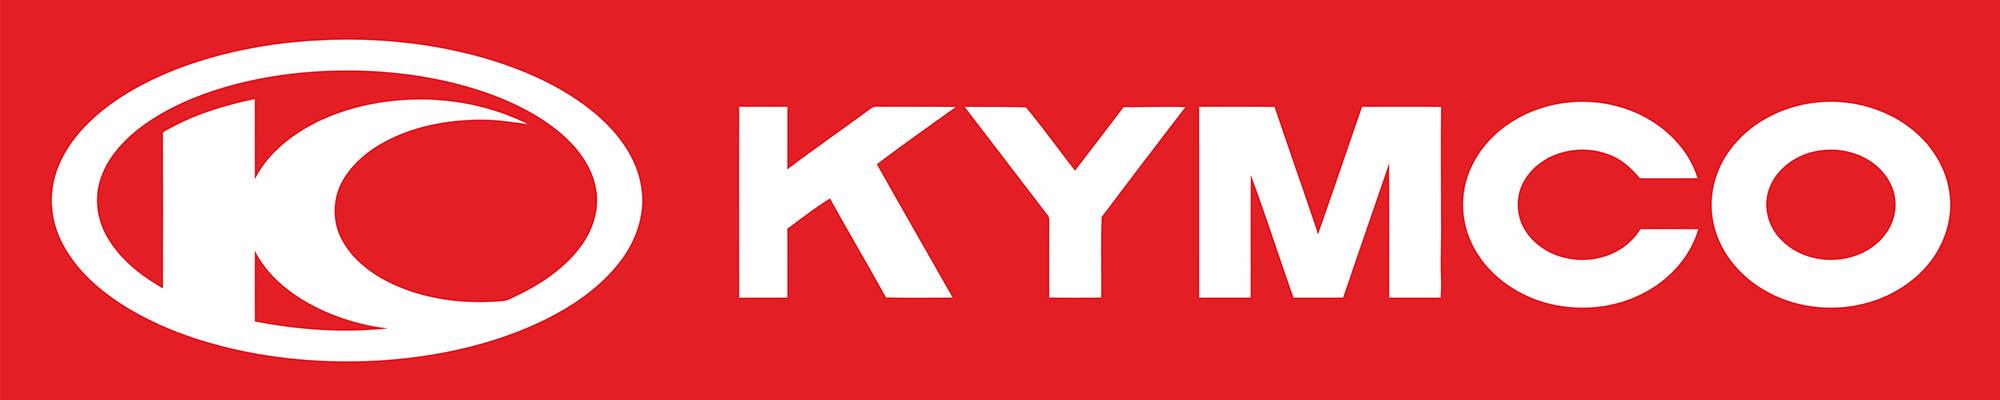 KYMCO логотип производителя